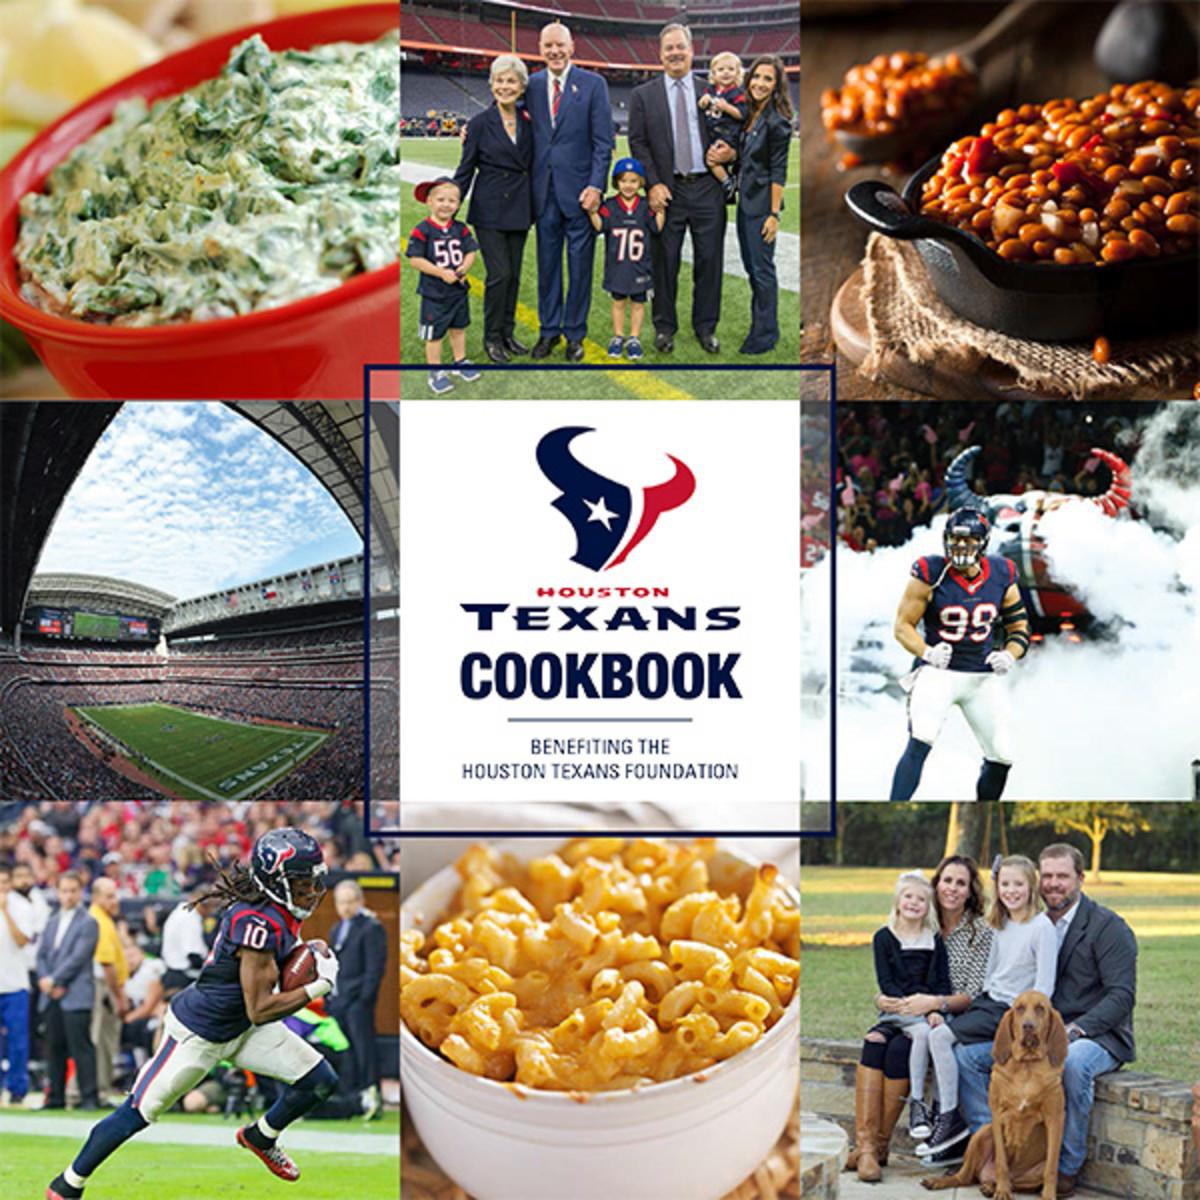 J.J. Watt excited Texans. Houston Texans Cookbook cover 81f2709cd